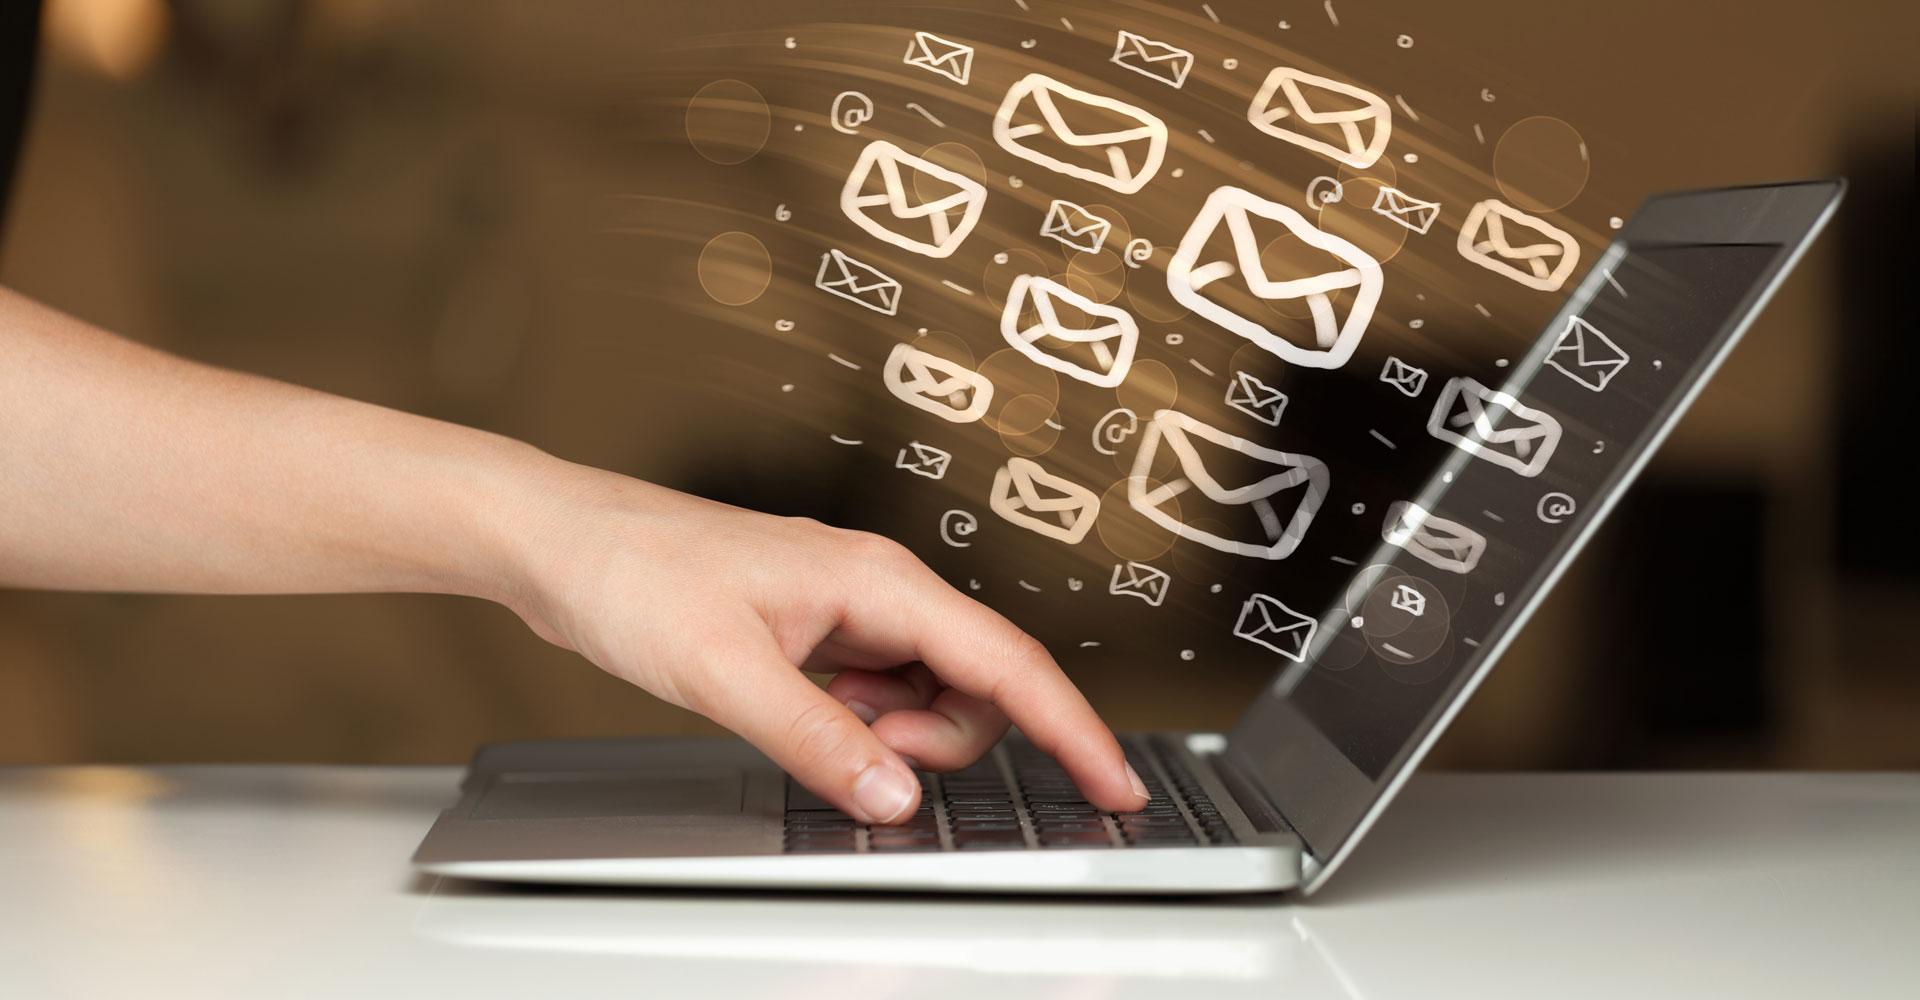 Lettere Ed Email Di Ac Pagnamento Al Curriculum Le Risposte Ai 3